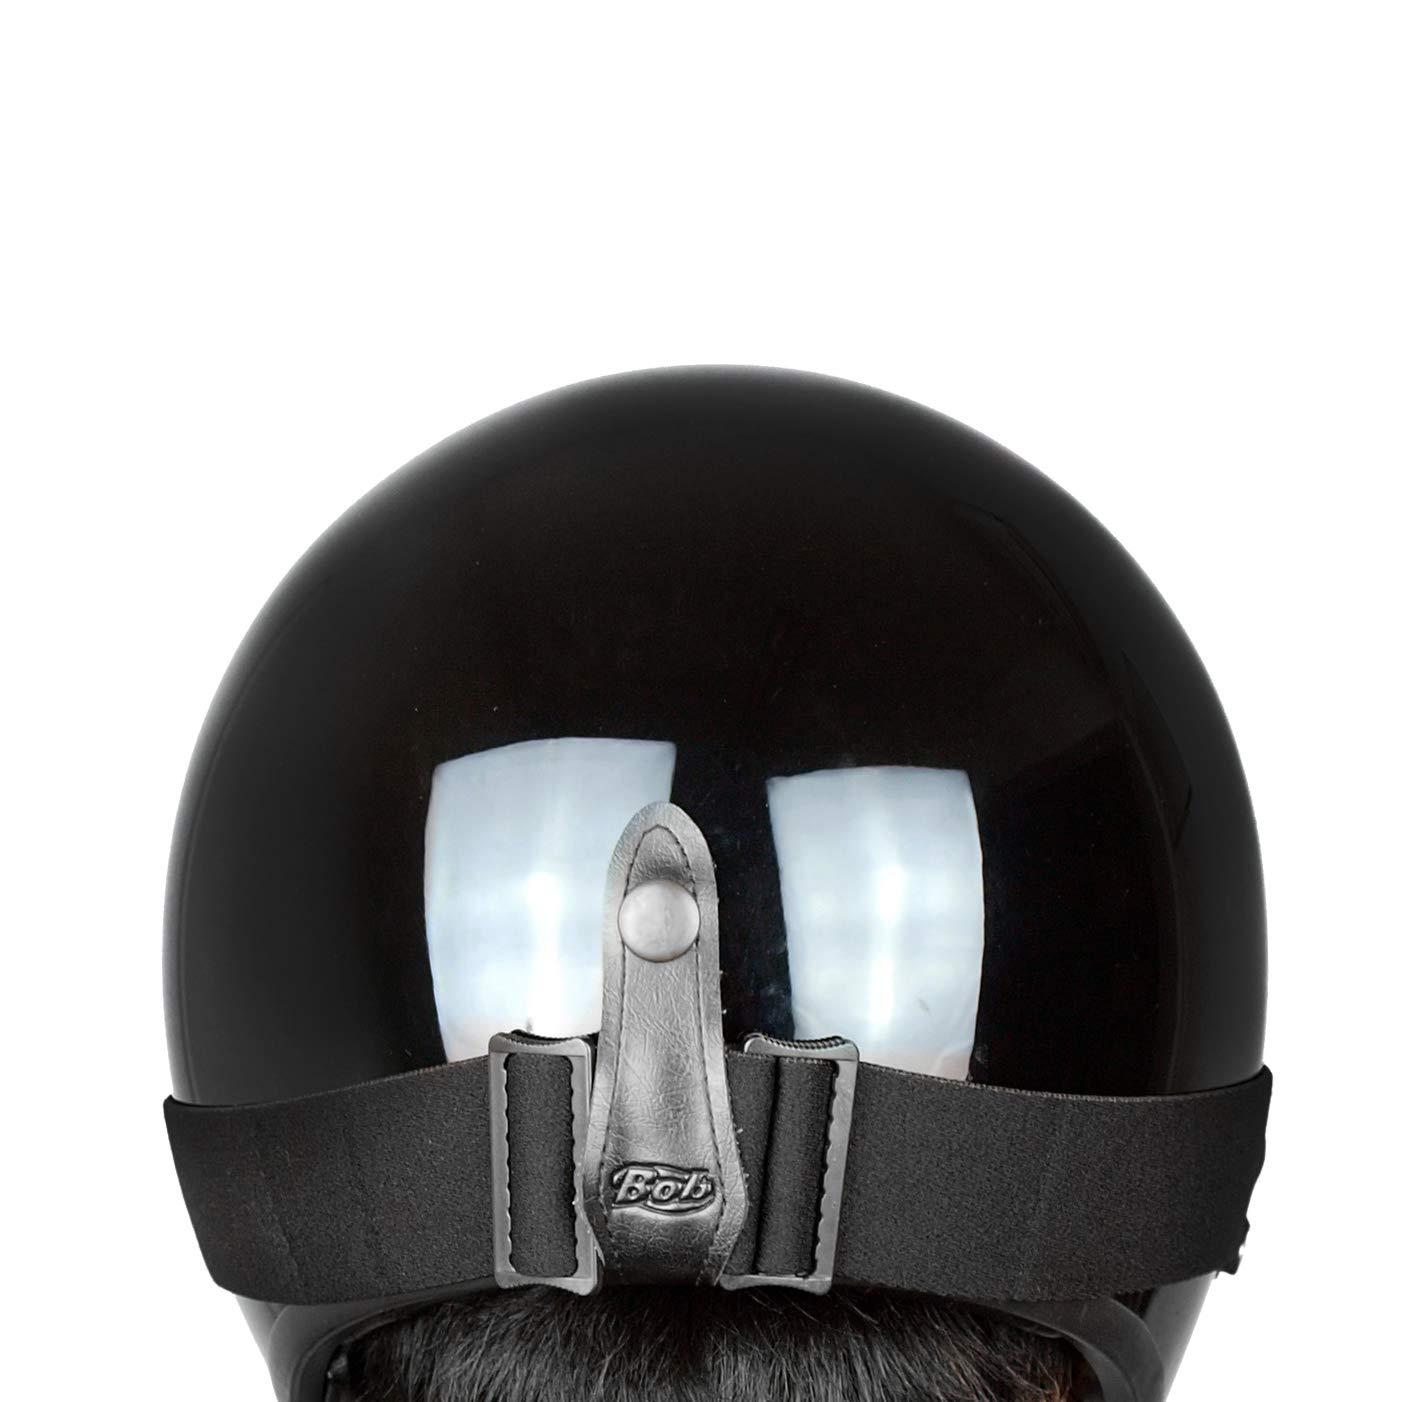 Motorcycle Goggles face mask BLACK bikestore gogleface mask